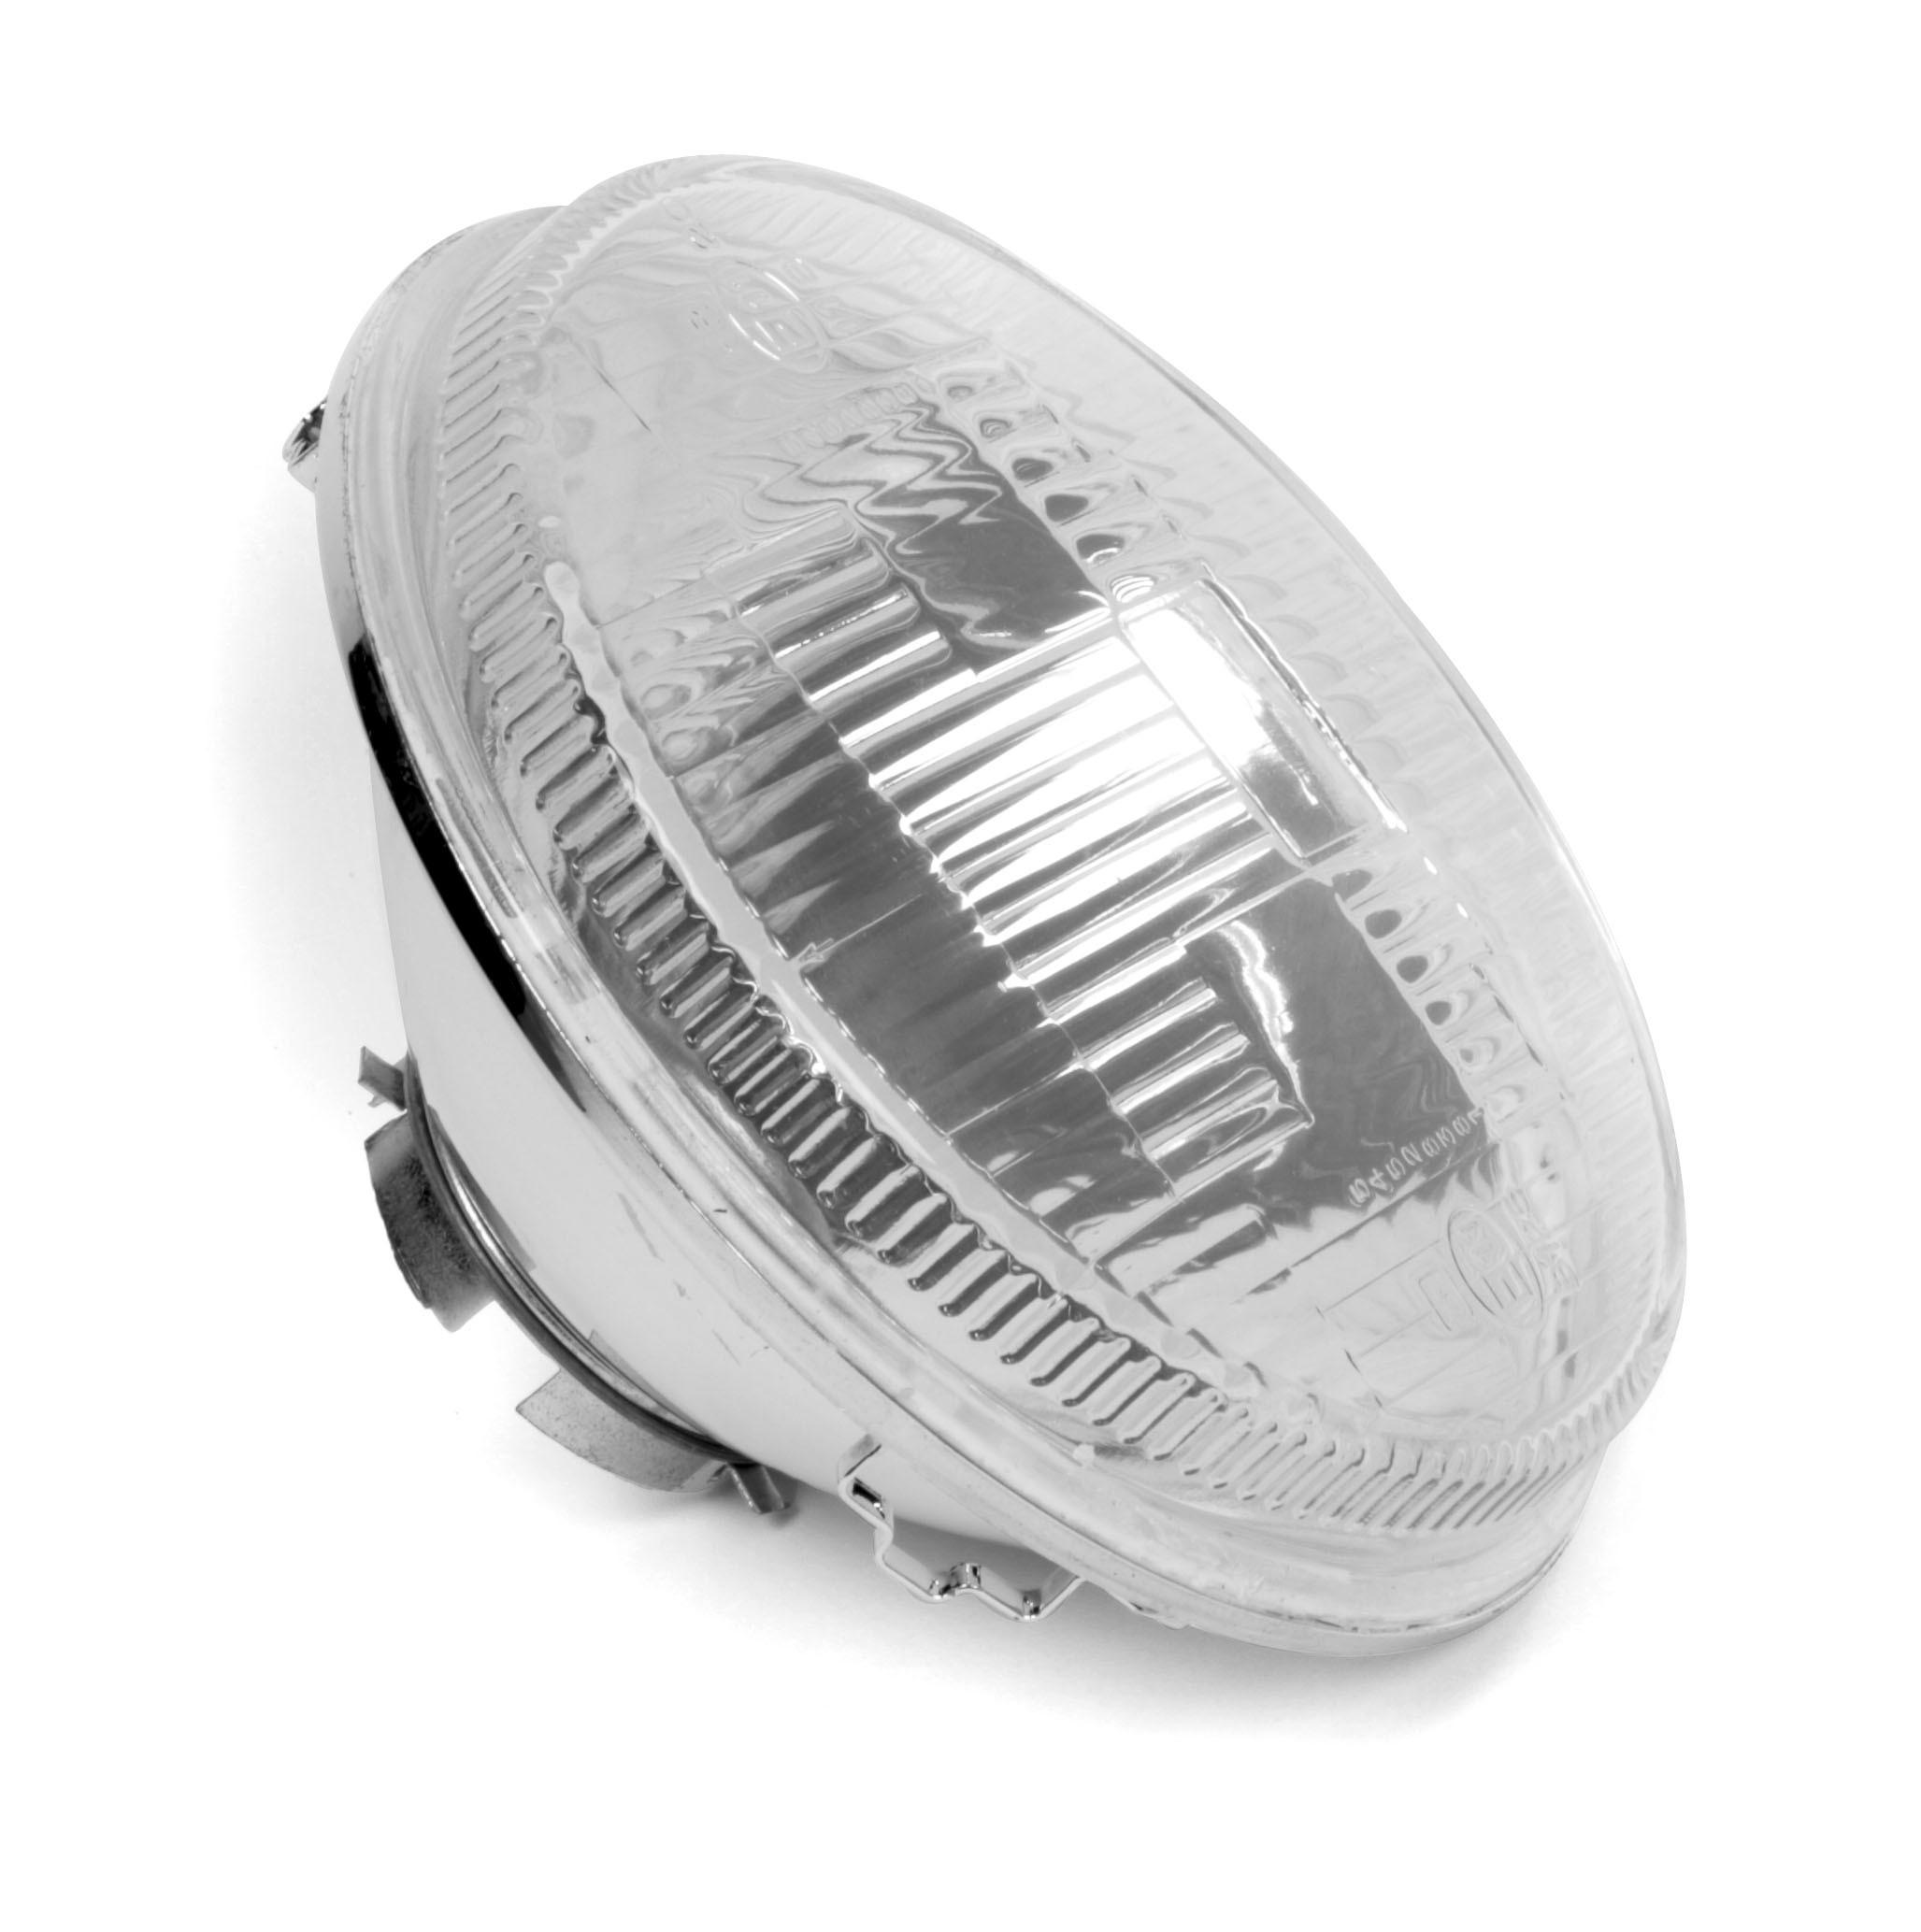 Jaguar H4 Halogen headlamp